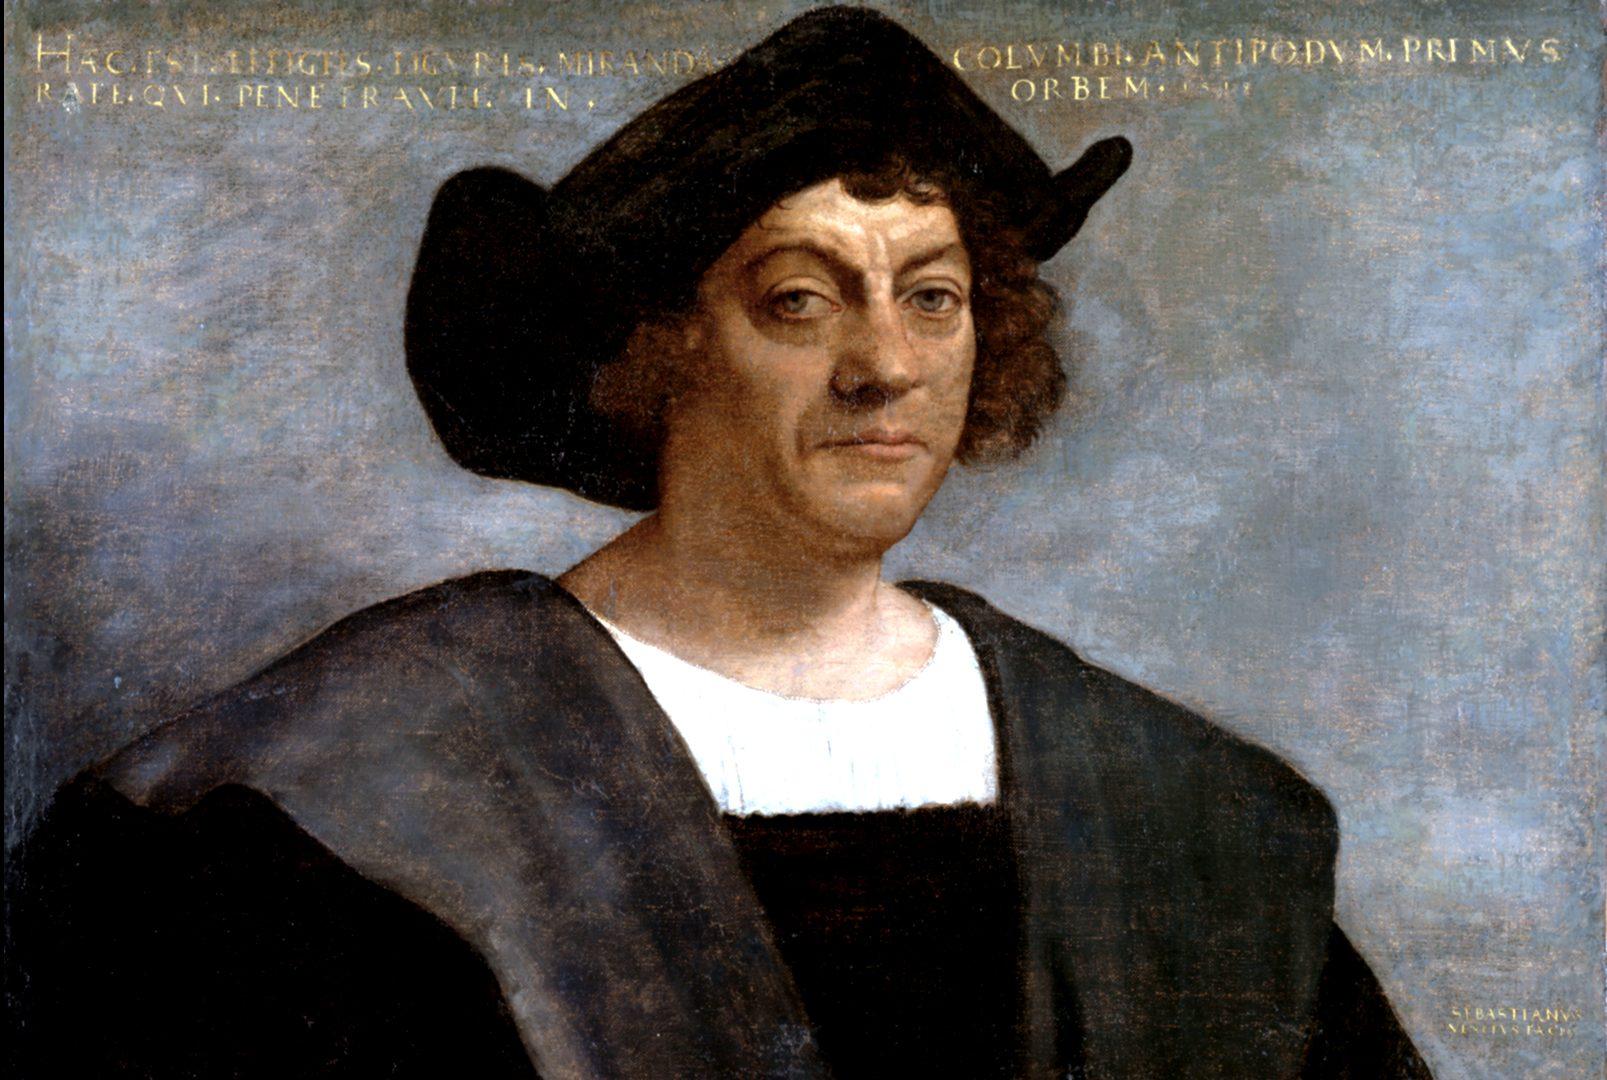 Altes Portrait von Kolumbus.